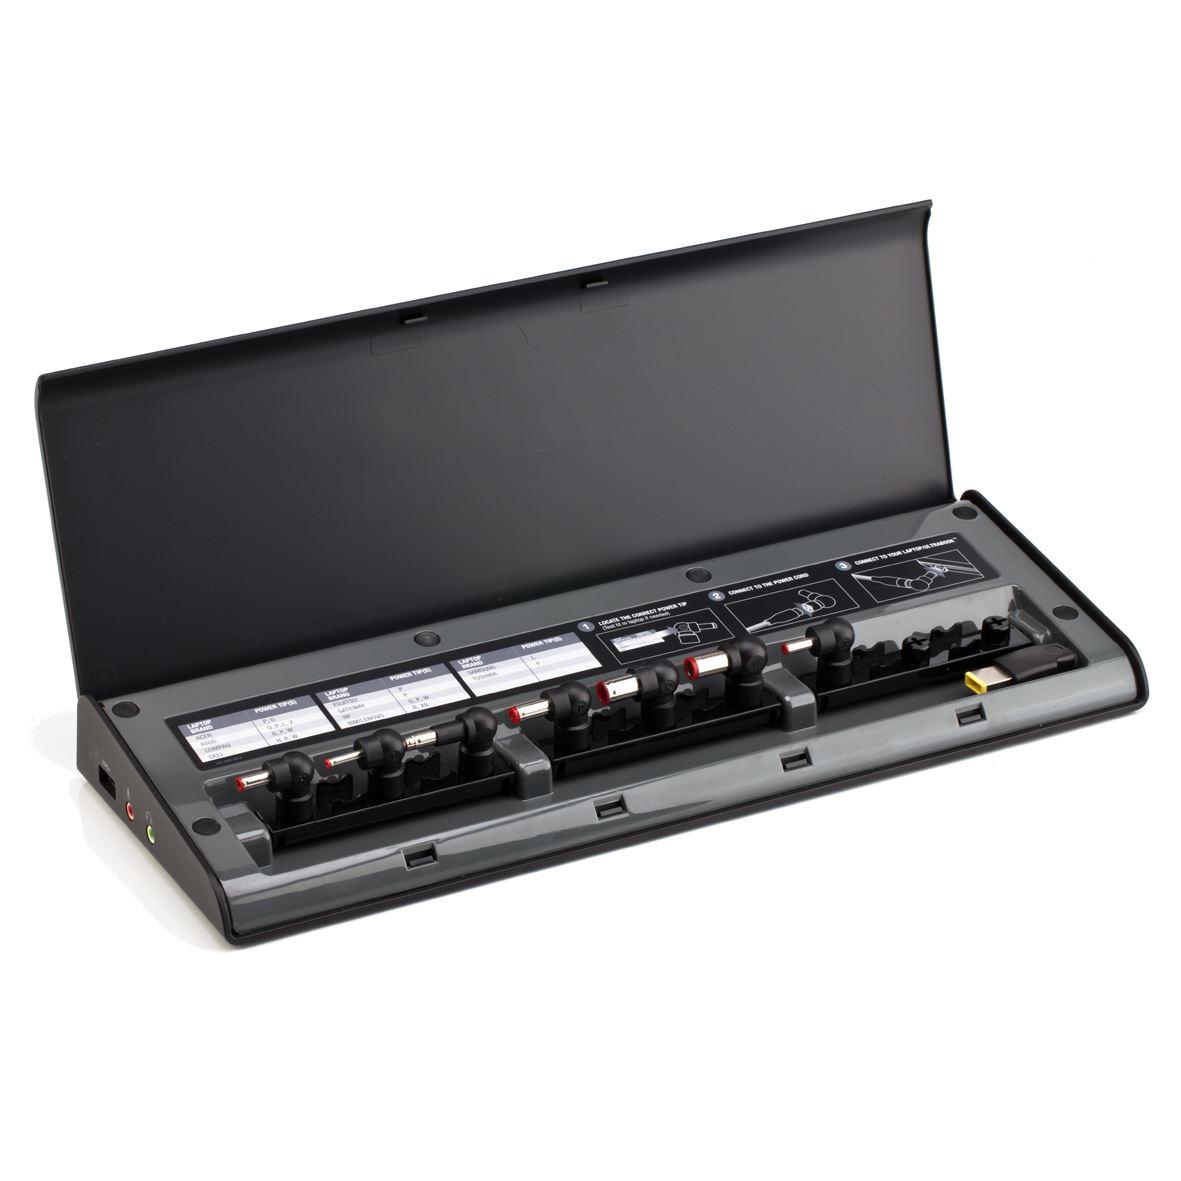 Black Targus ACP77EUZ USB Universal Docking Station